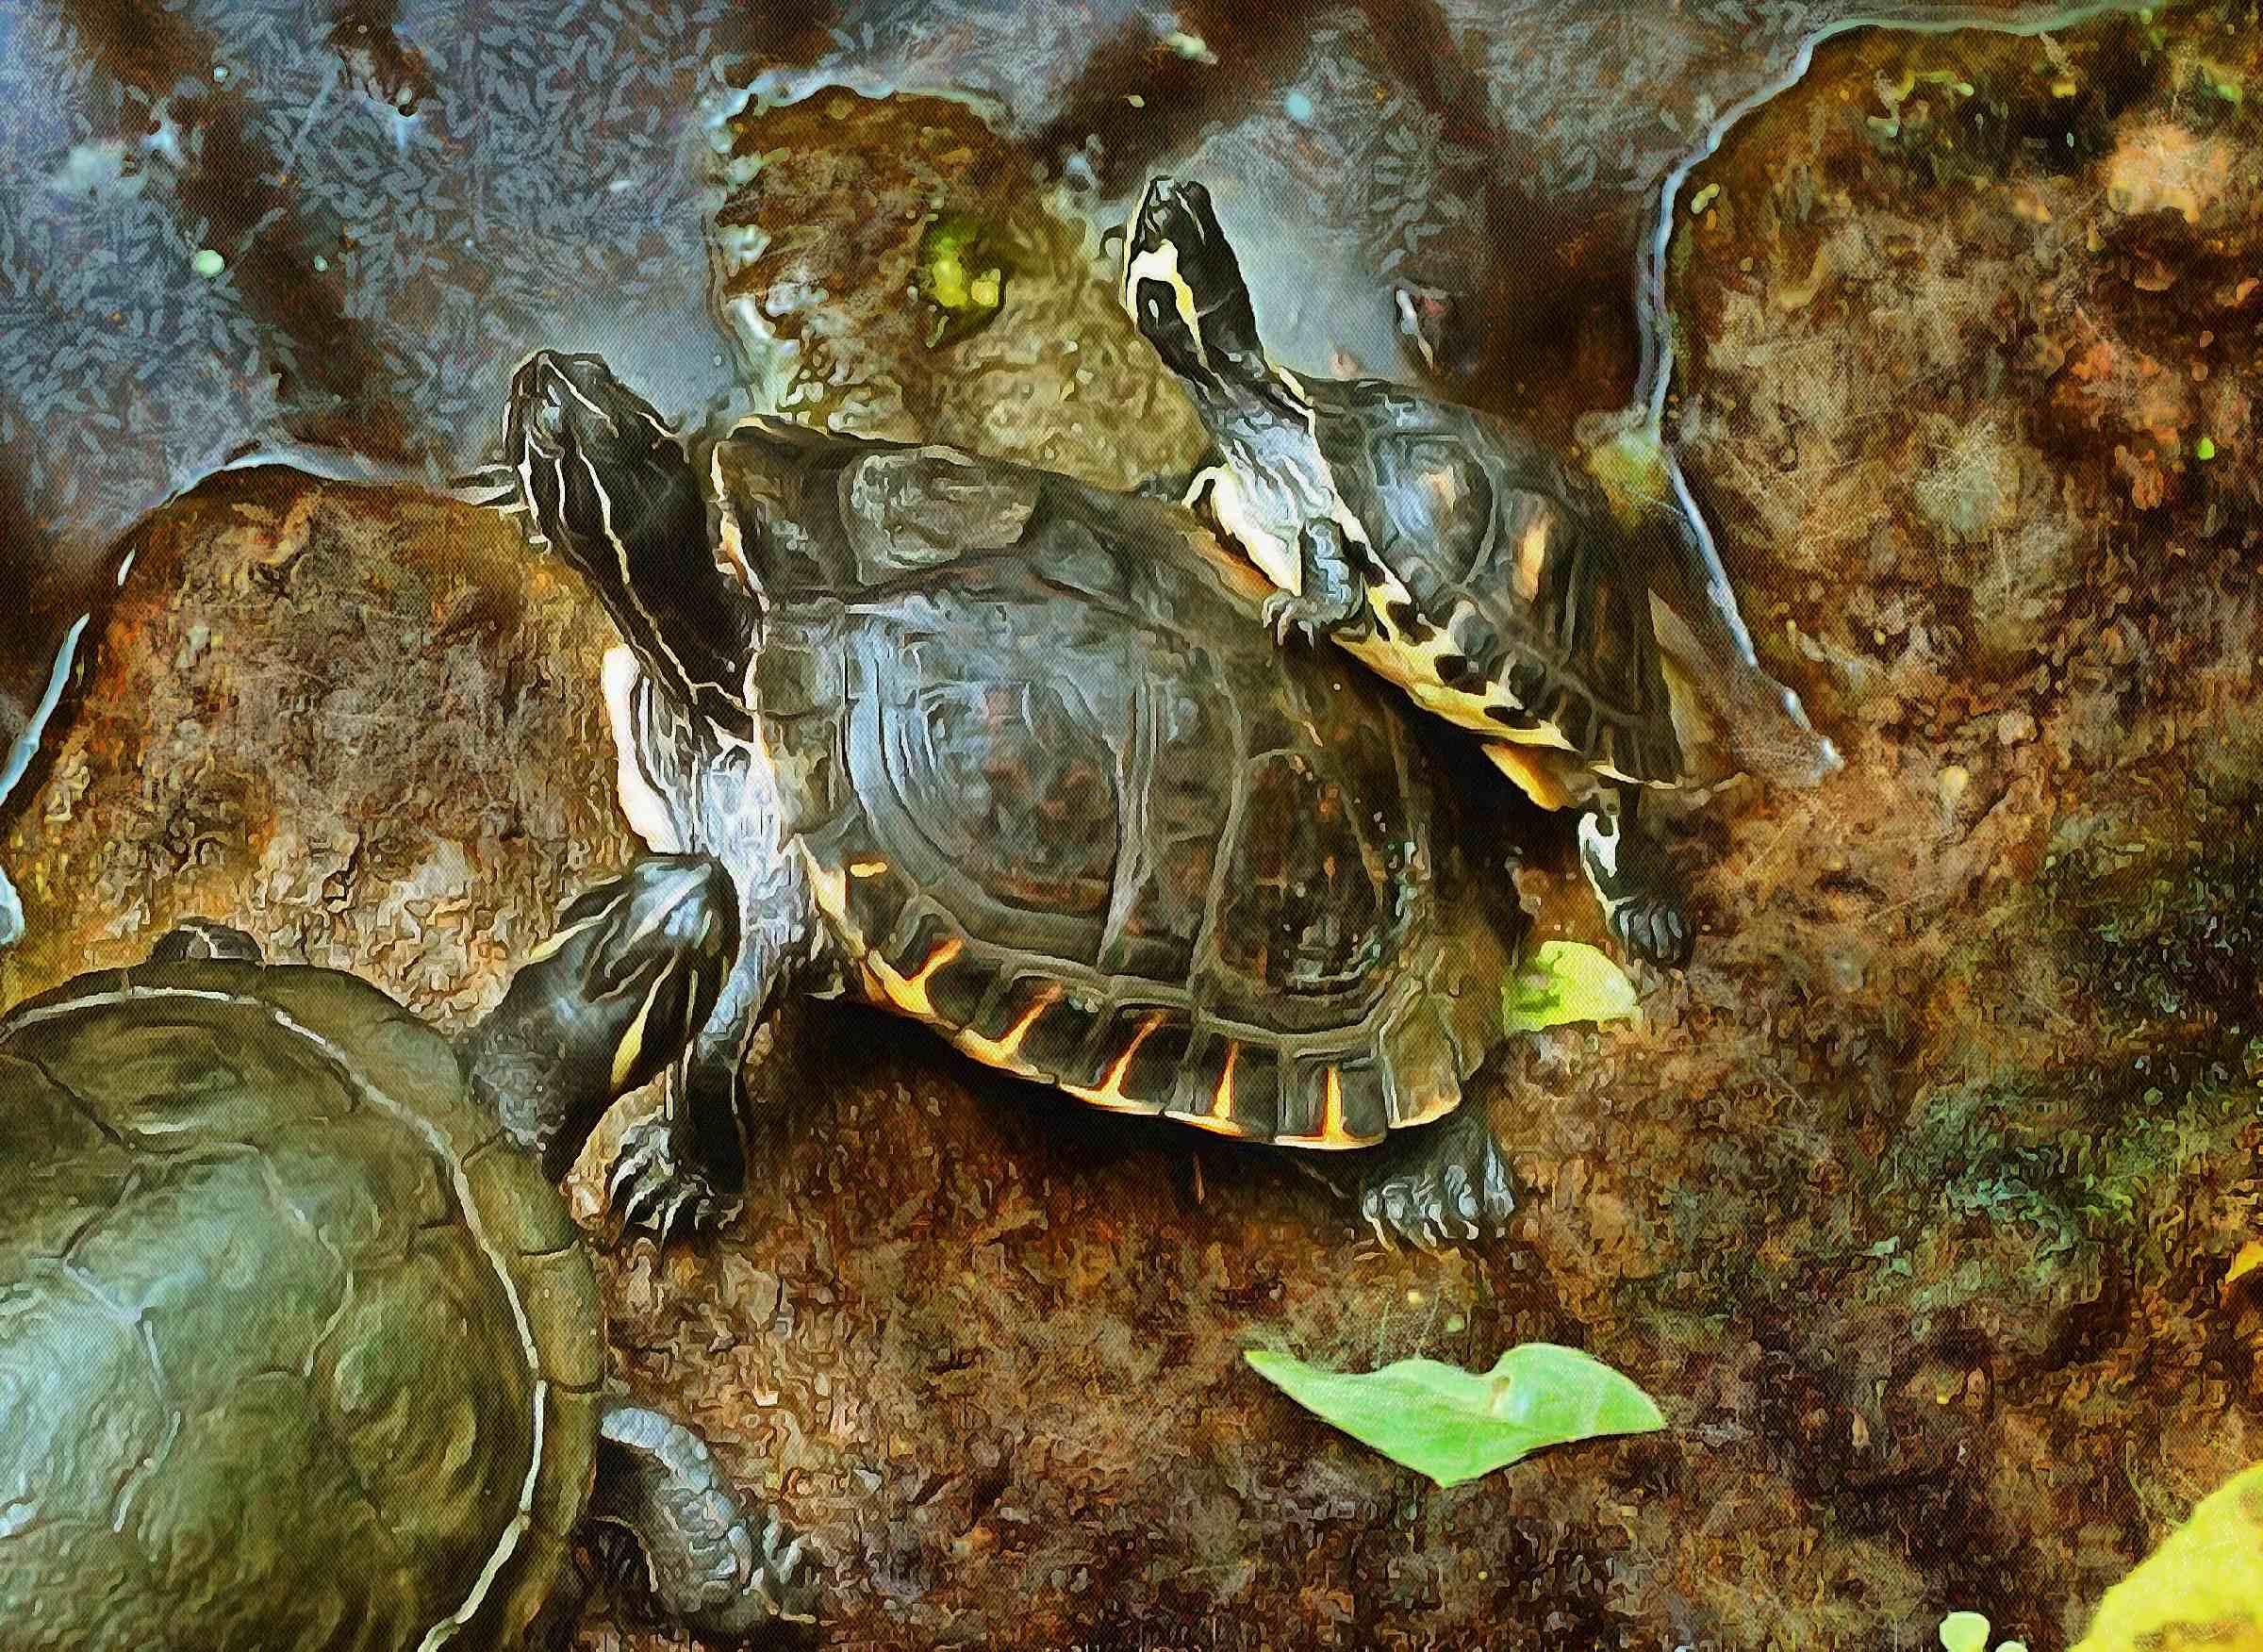 tortoise, turtle, turtle free, tortoise free, free image turtle, free image tortoise, public domain image!